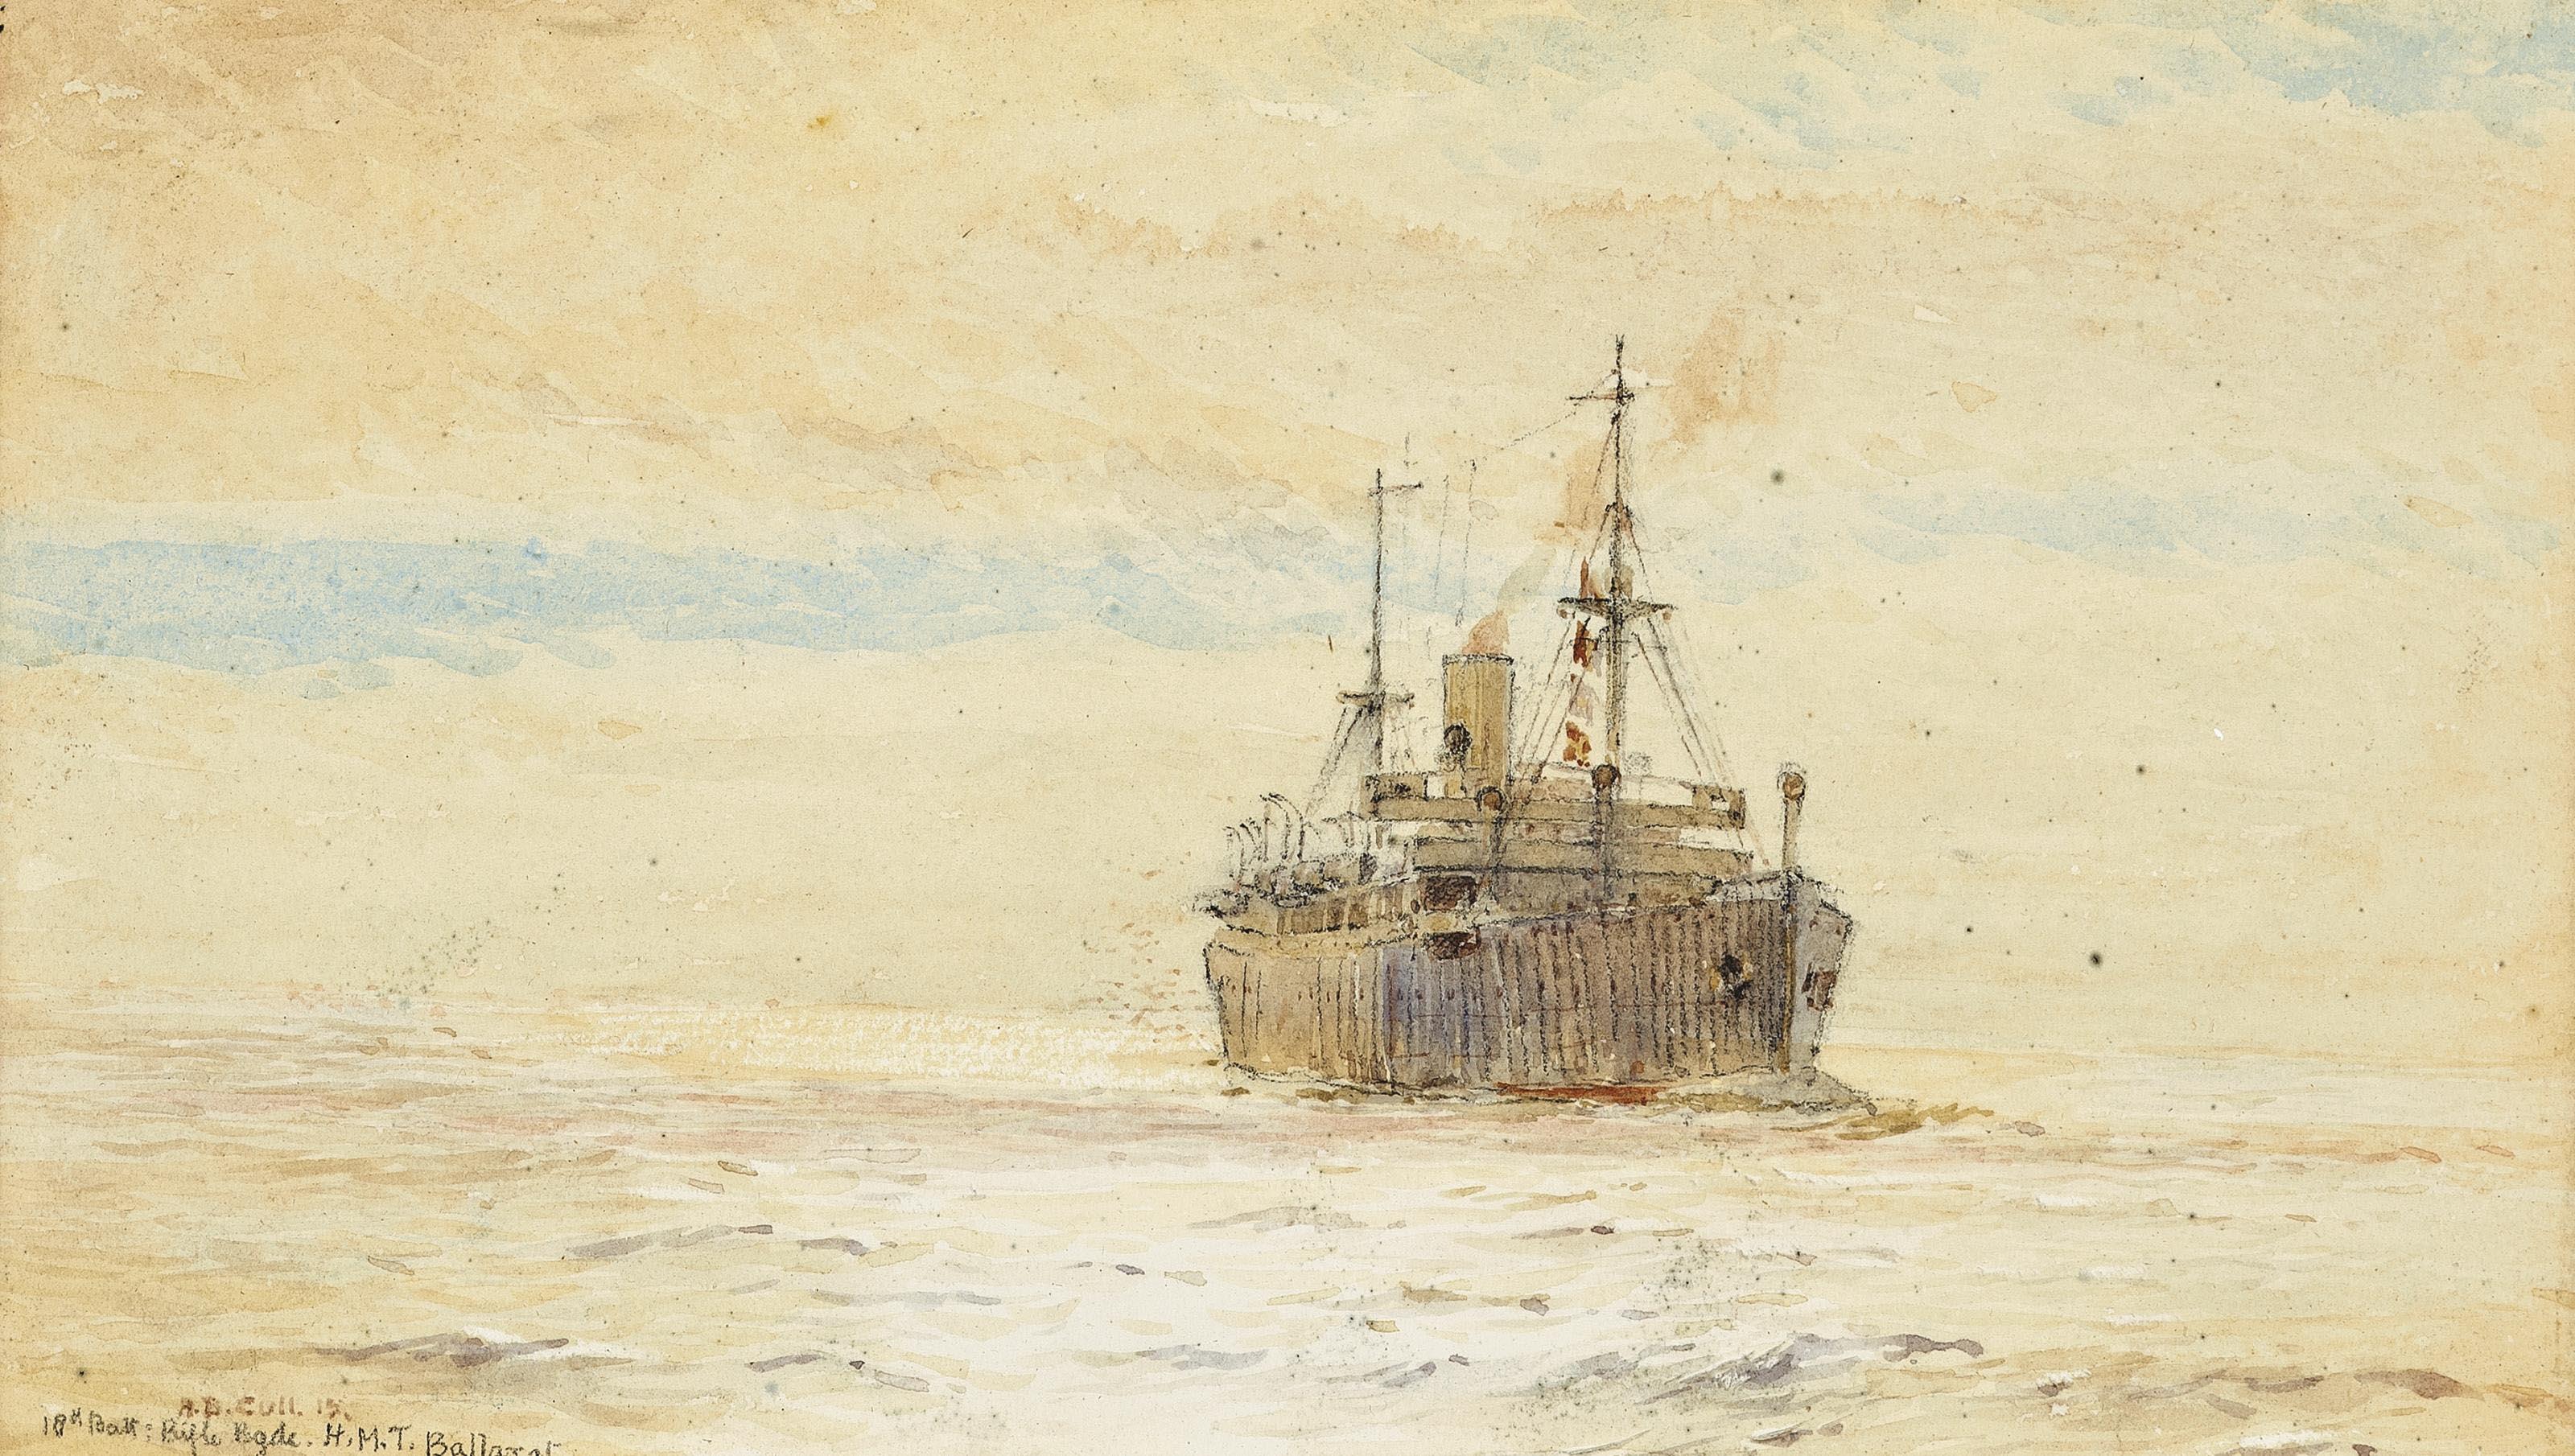 H.M.T. Ballarat in calm seas